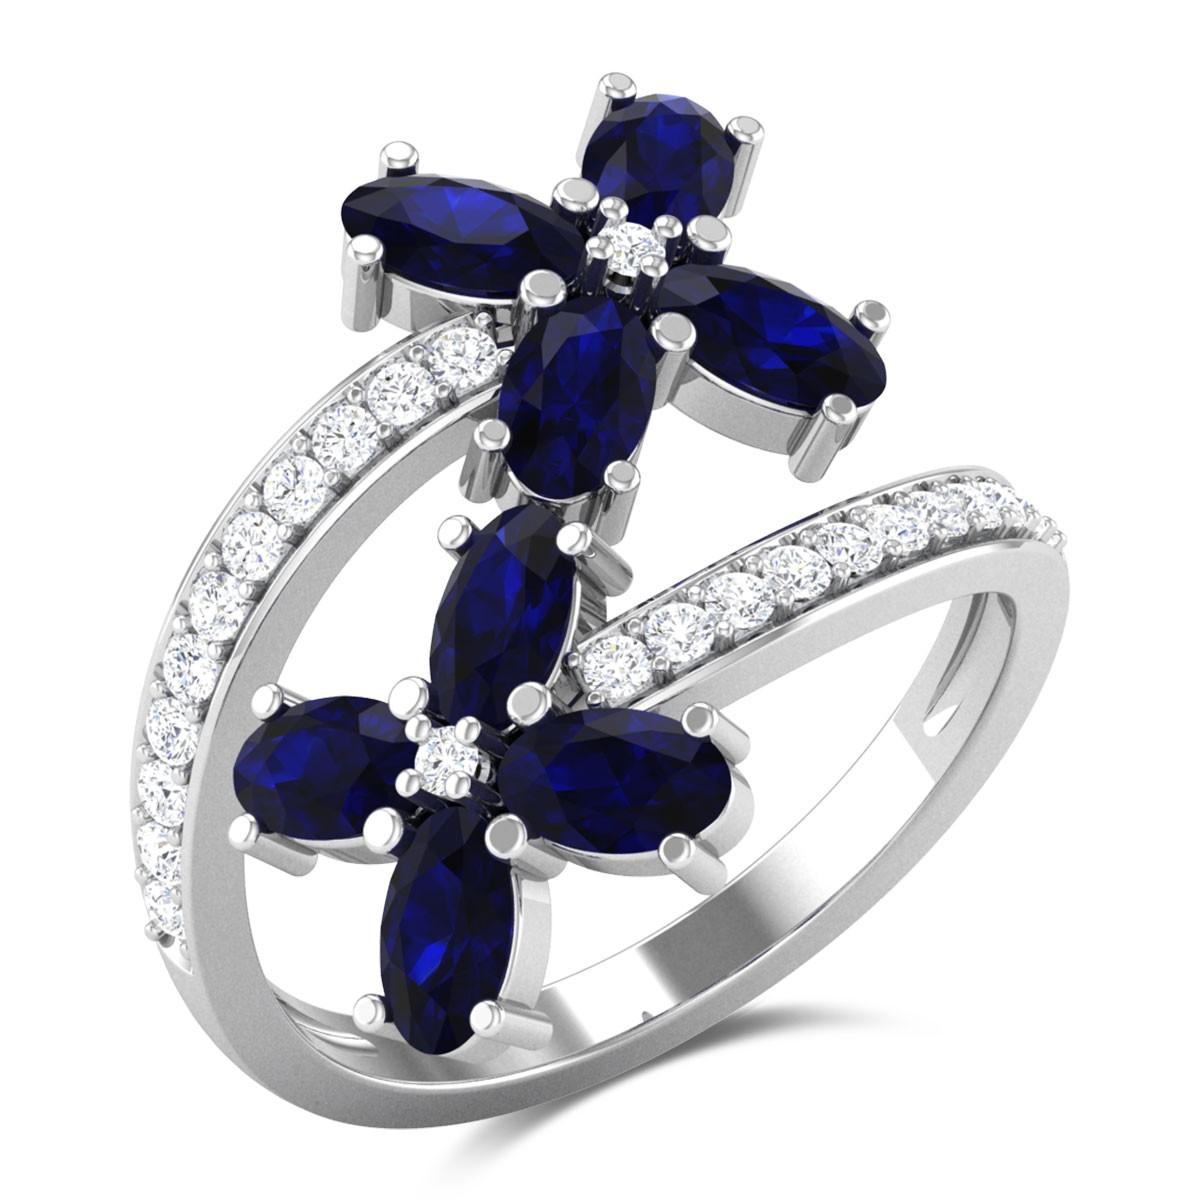 Adorabella Sapphire Floral Ring